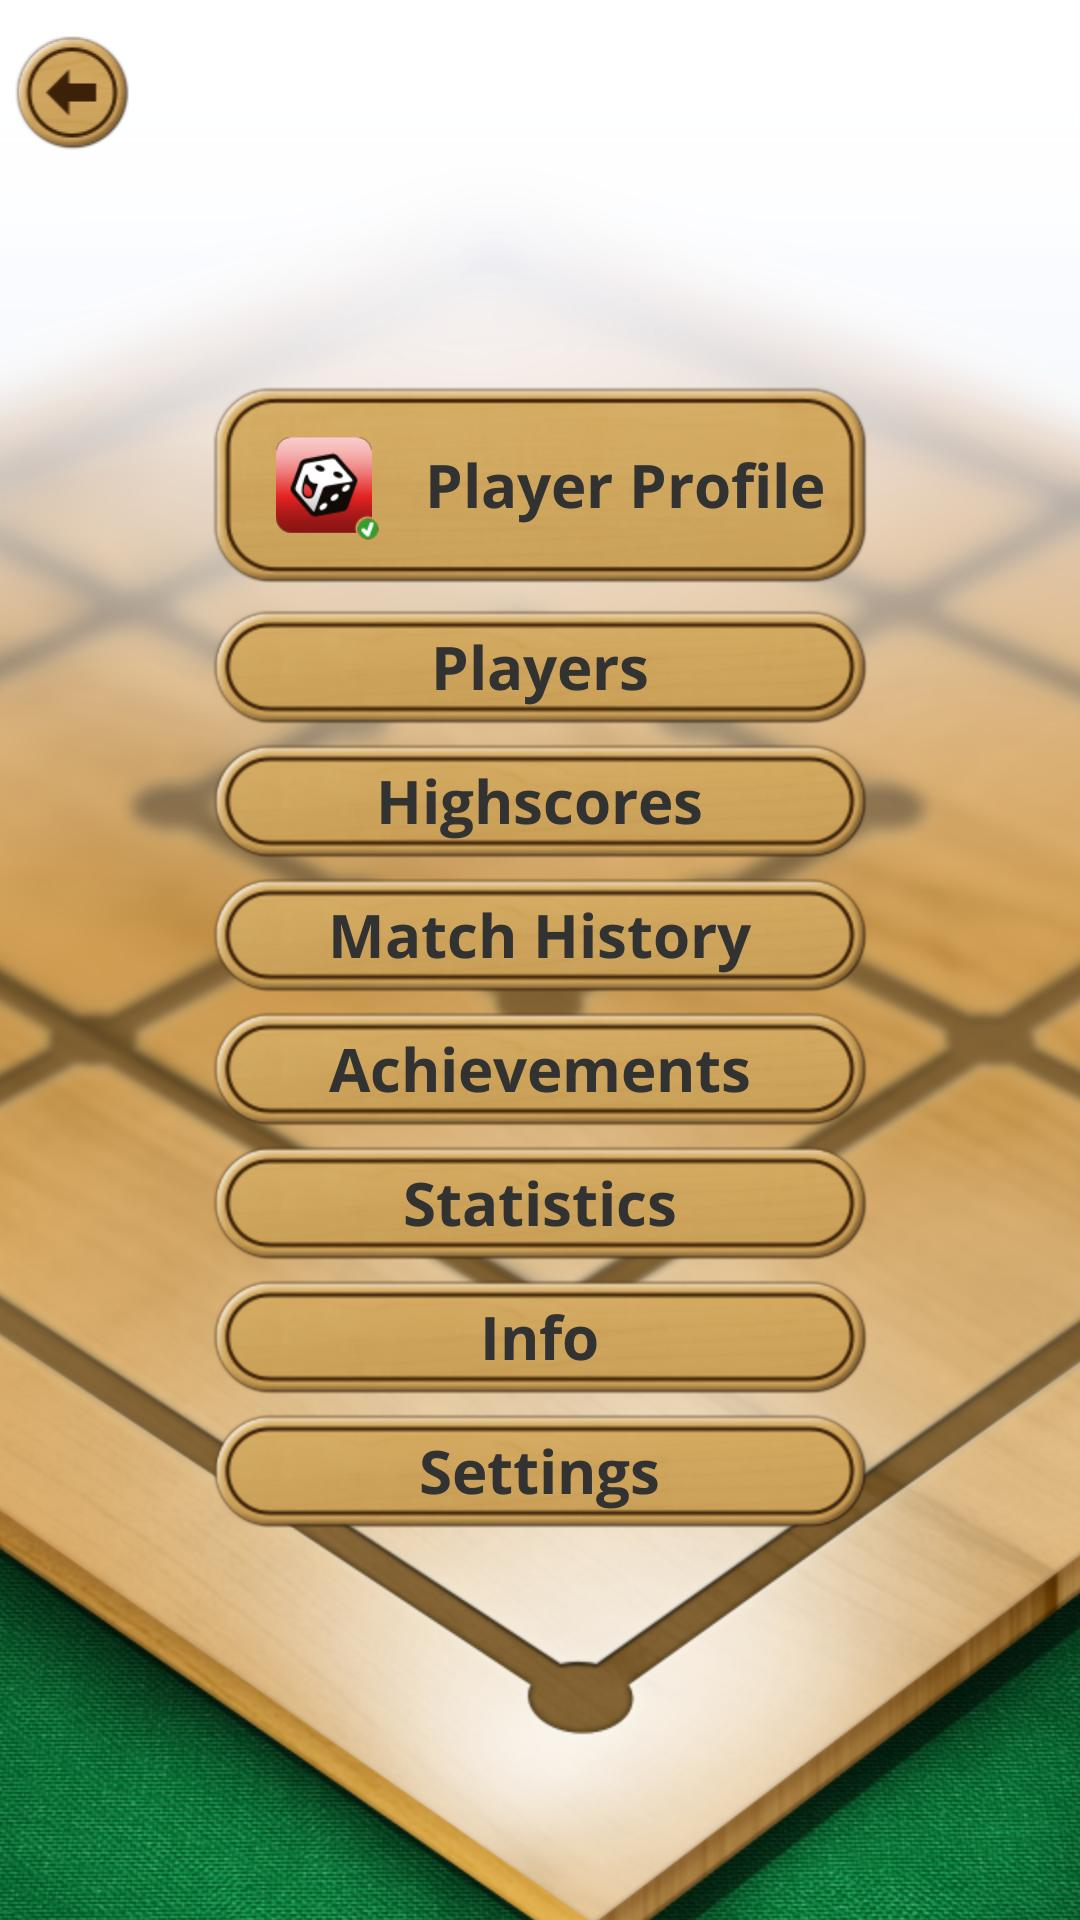 Nine men's Morris - Mills - Free online board game 2.8.11 Screenshot 4